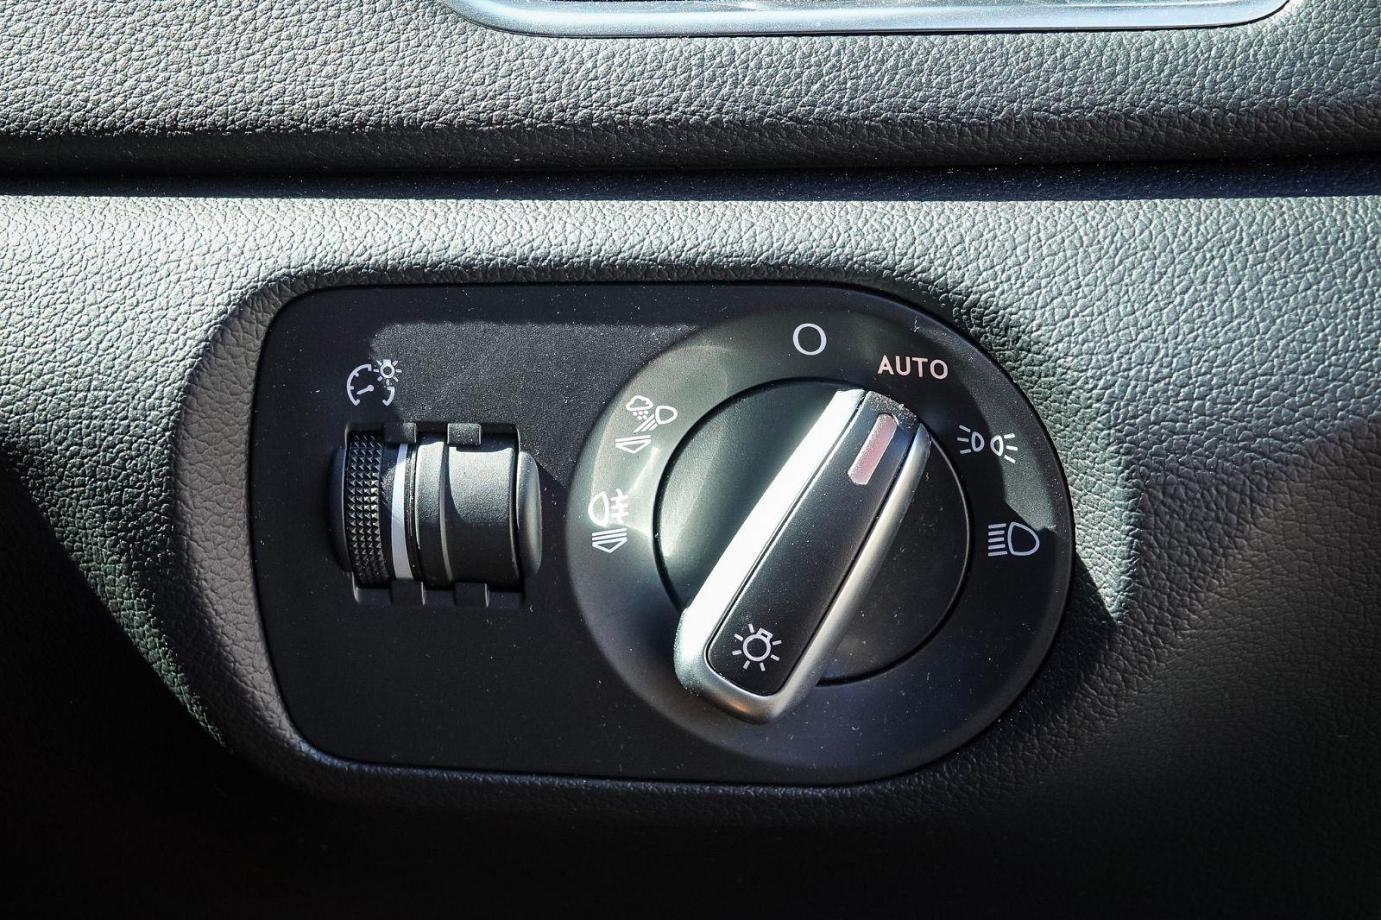 2015 Audi RS Q3 8U MY16. Wagon 5dr S tronic 7sp quattro 2.5T